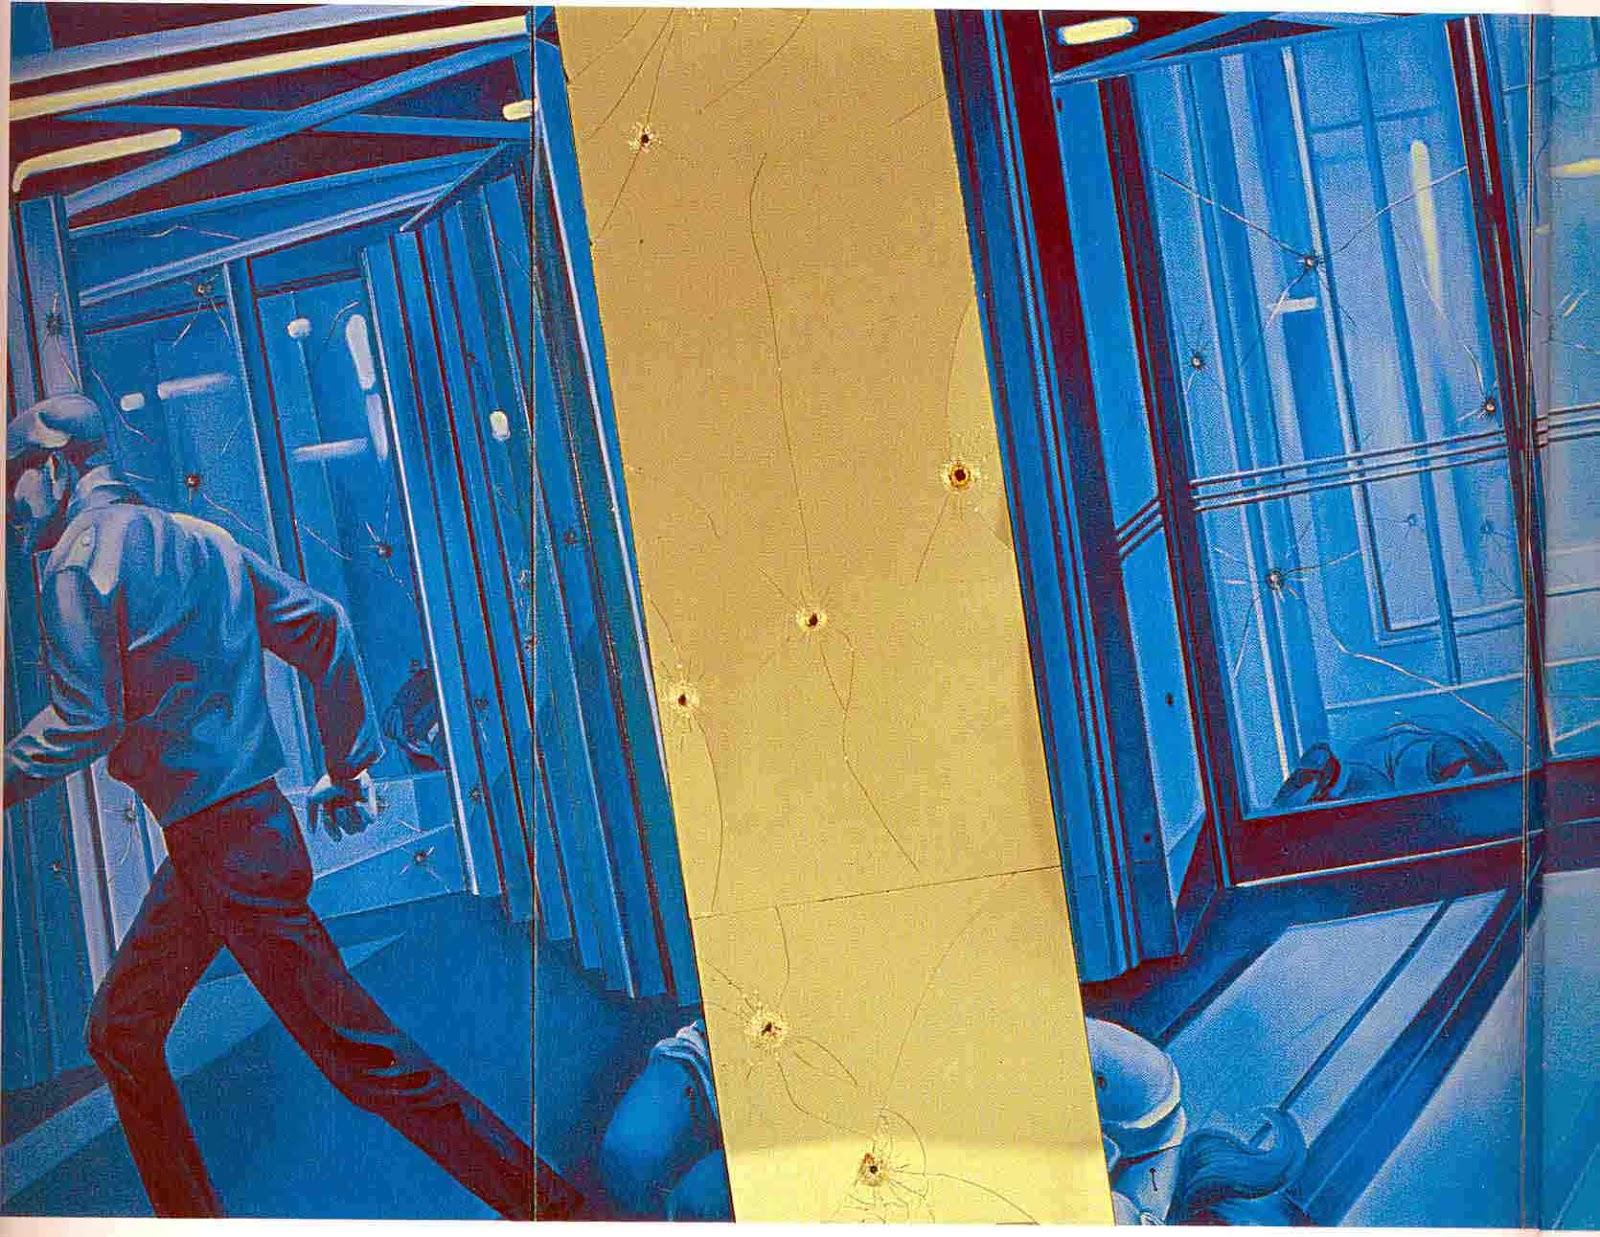 Fromanger g rard figuration narrative 3e objet d 39 tude for Figuration narrative